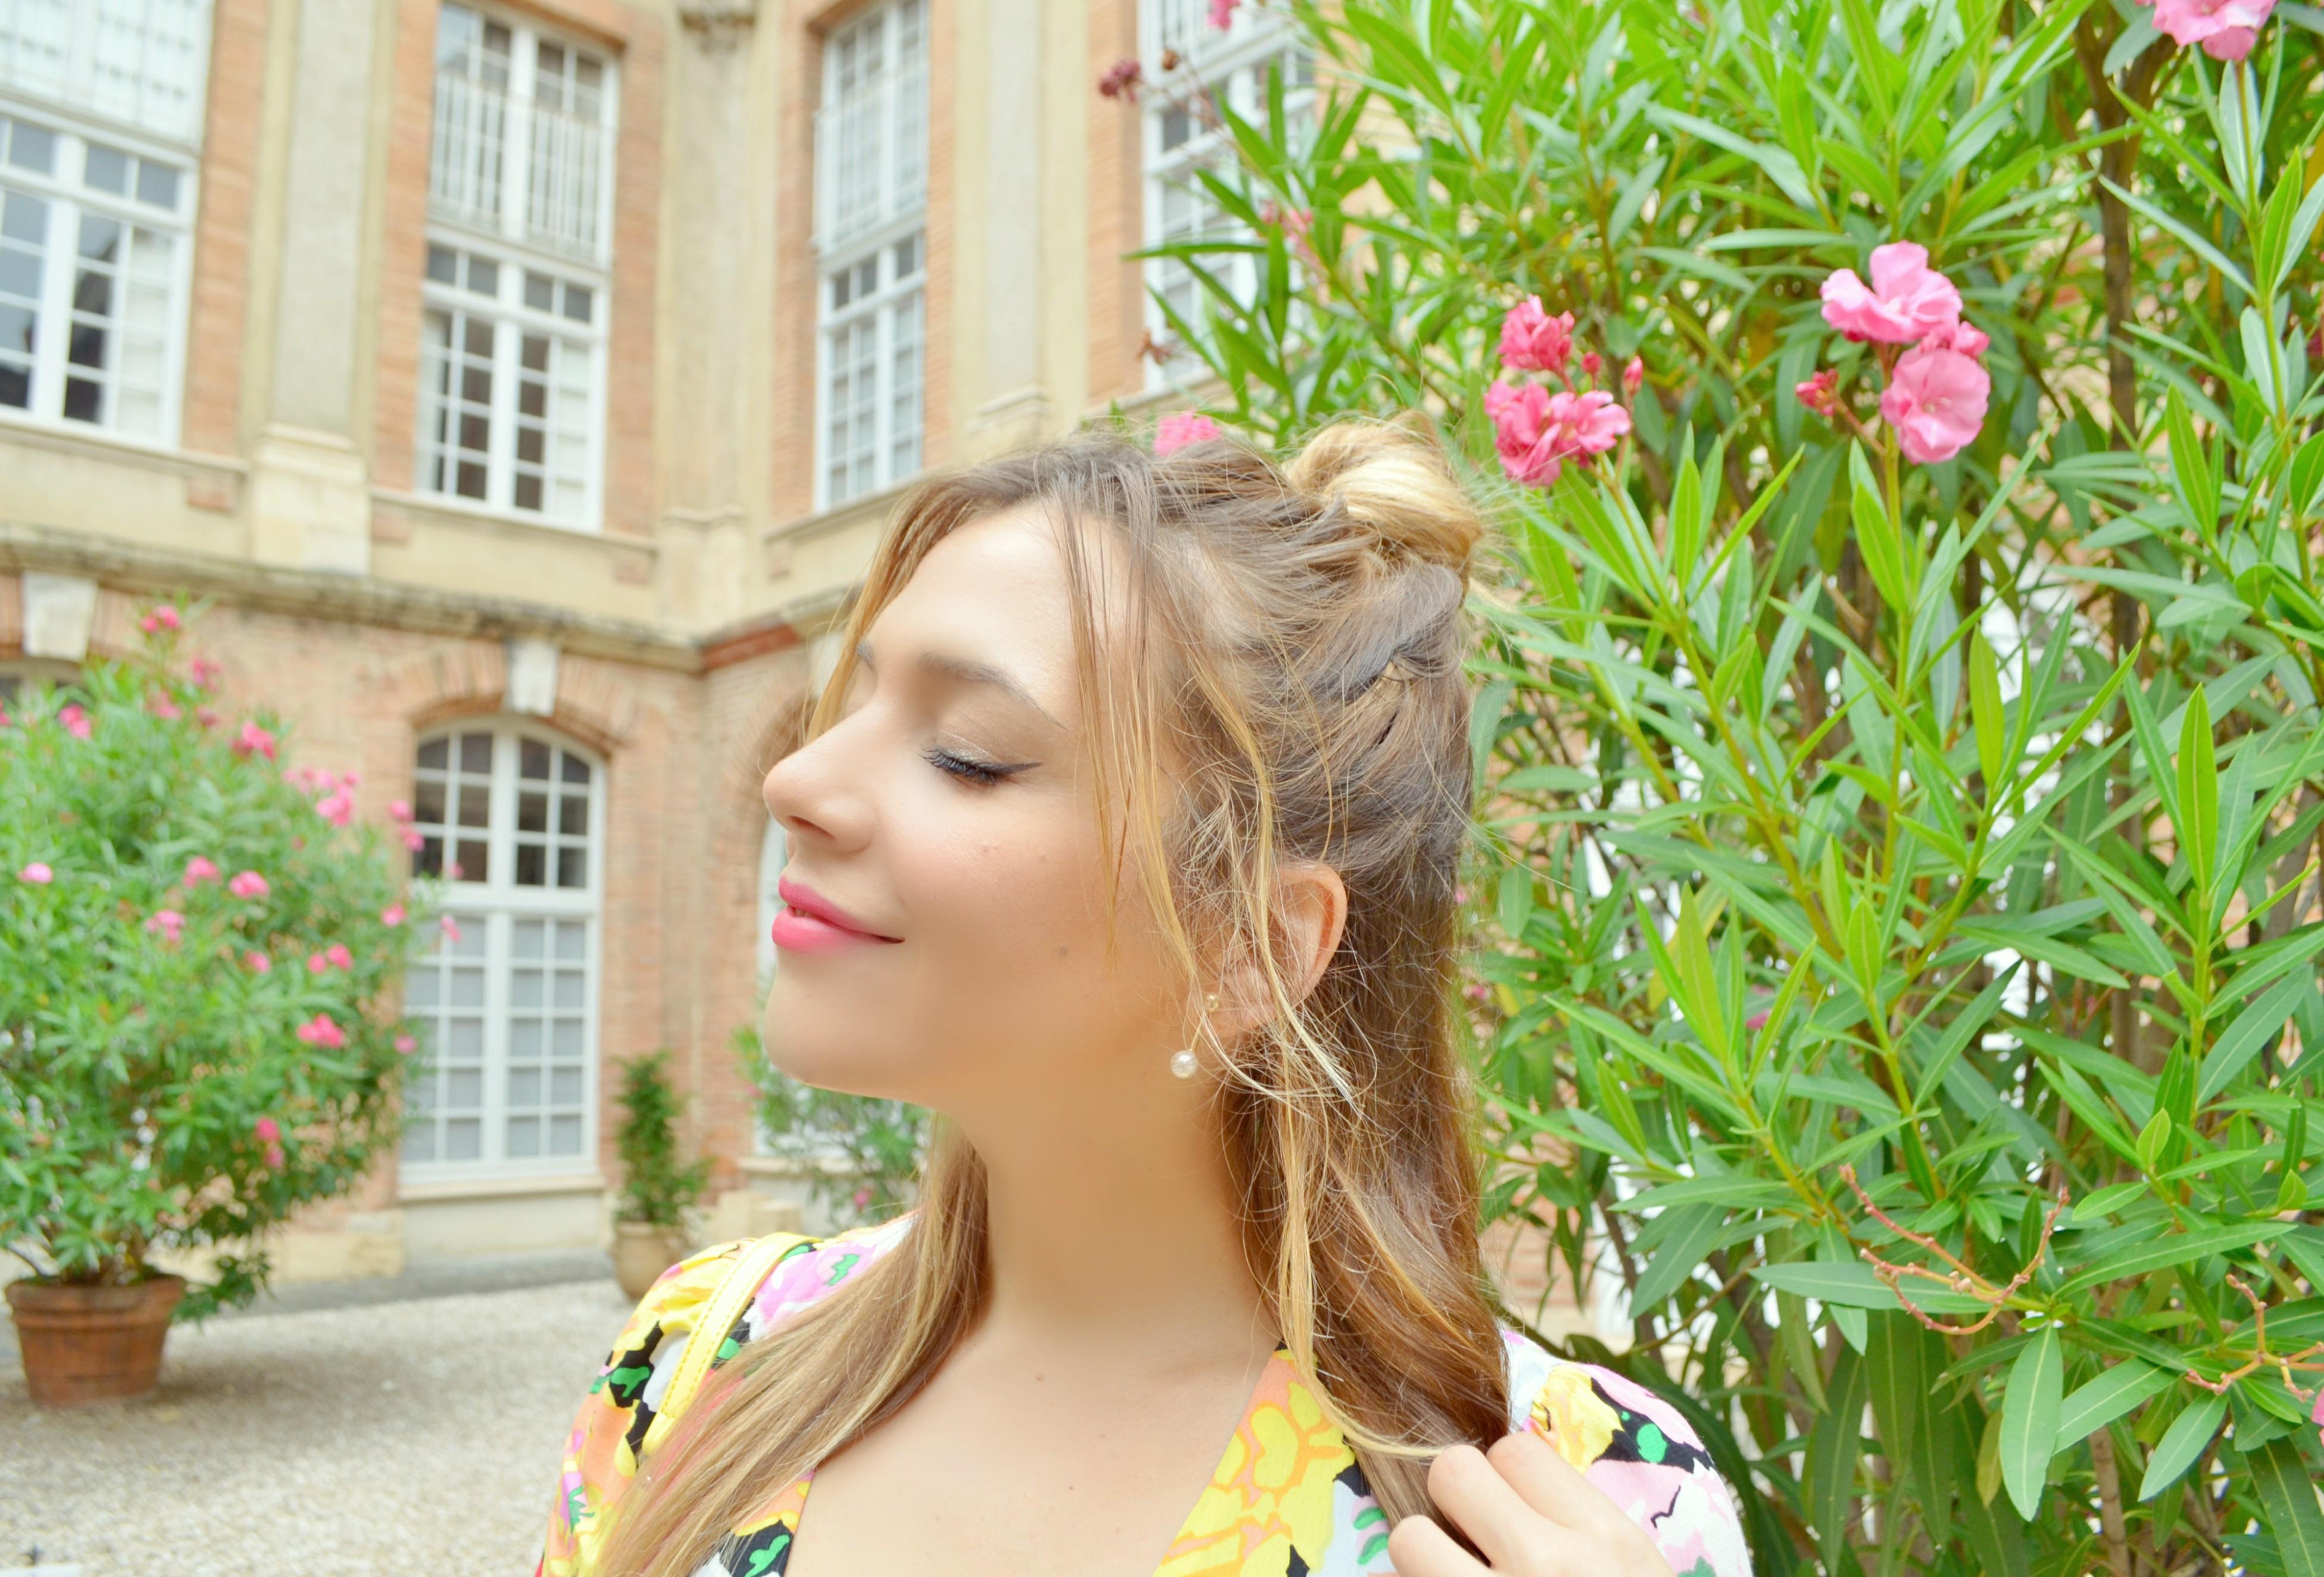 ChicAdicta-blog-de-moda-fashionista-Chic-Adicta-vestido-de-flores-zara-fashion-travel-que-ver-en-toulouse-influencer-PiensaenChic-Piensa-en-Chic